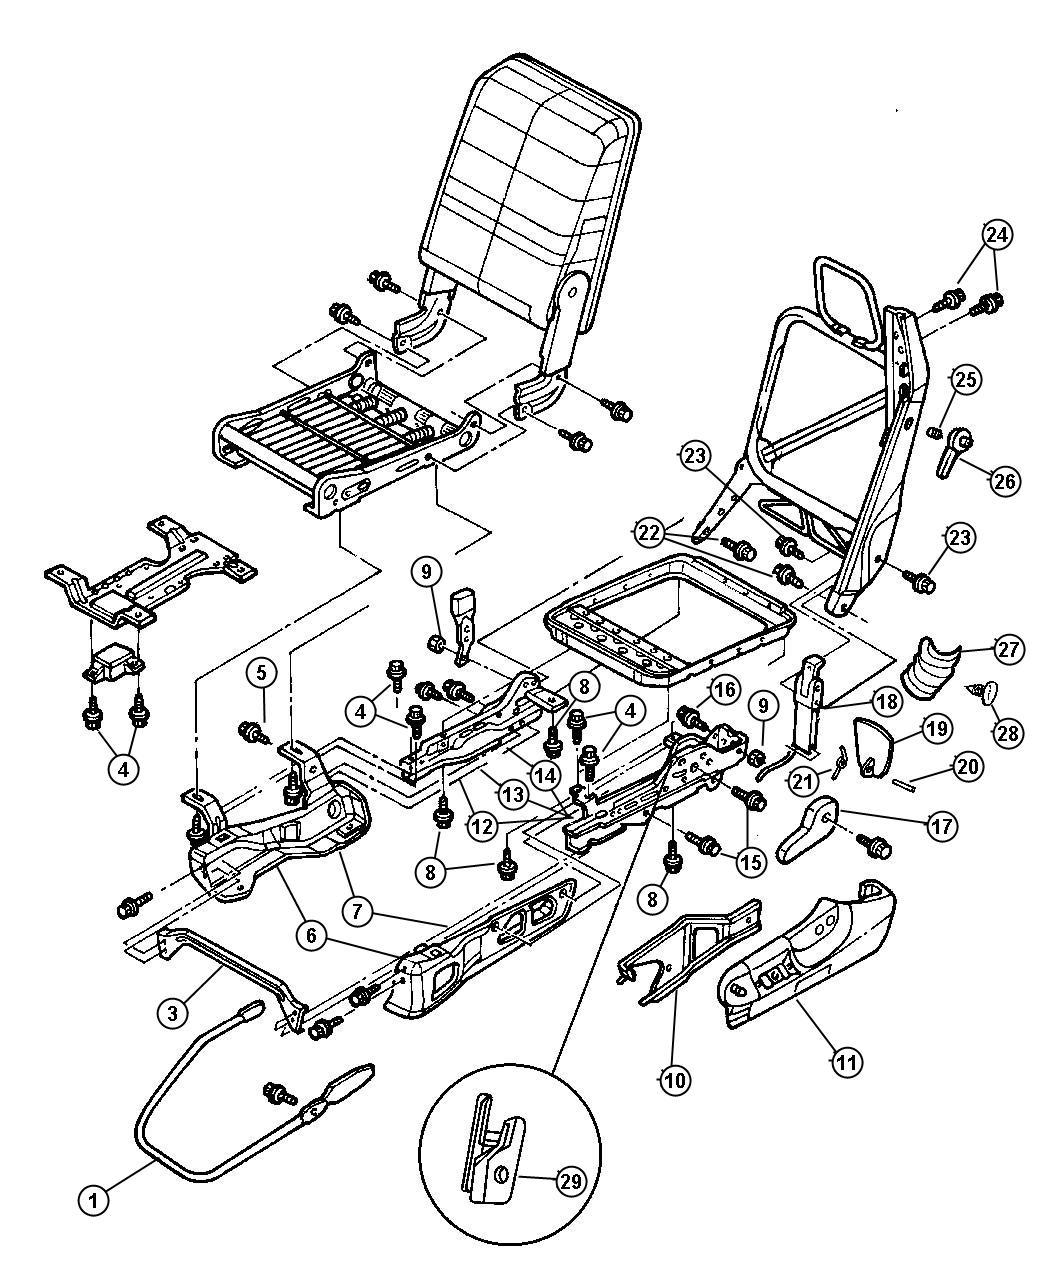 1998 Dodge Ram 2500 Riser. Seat. Driver, outboard